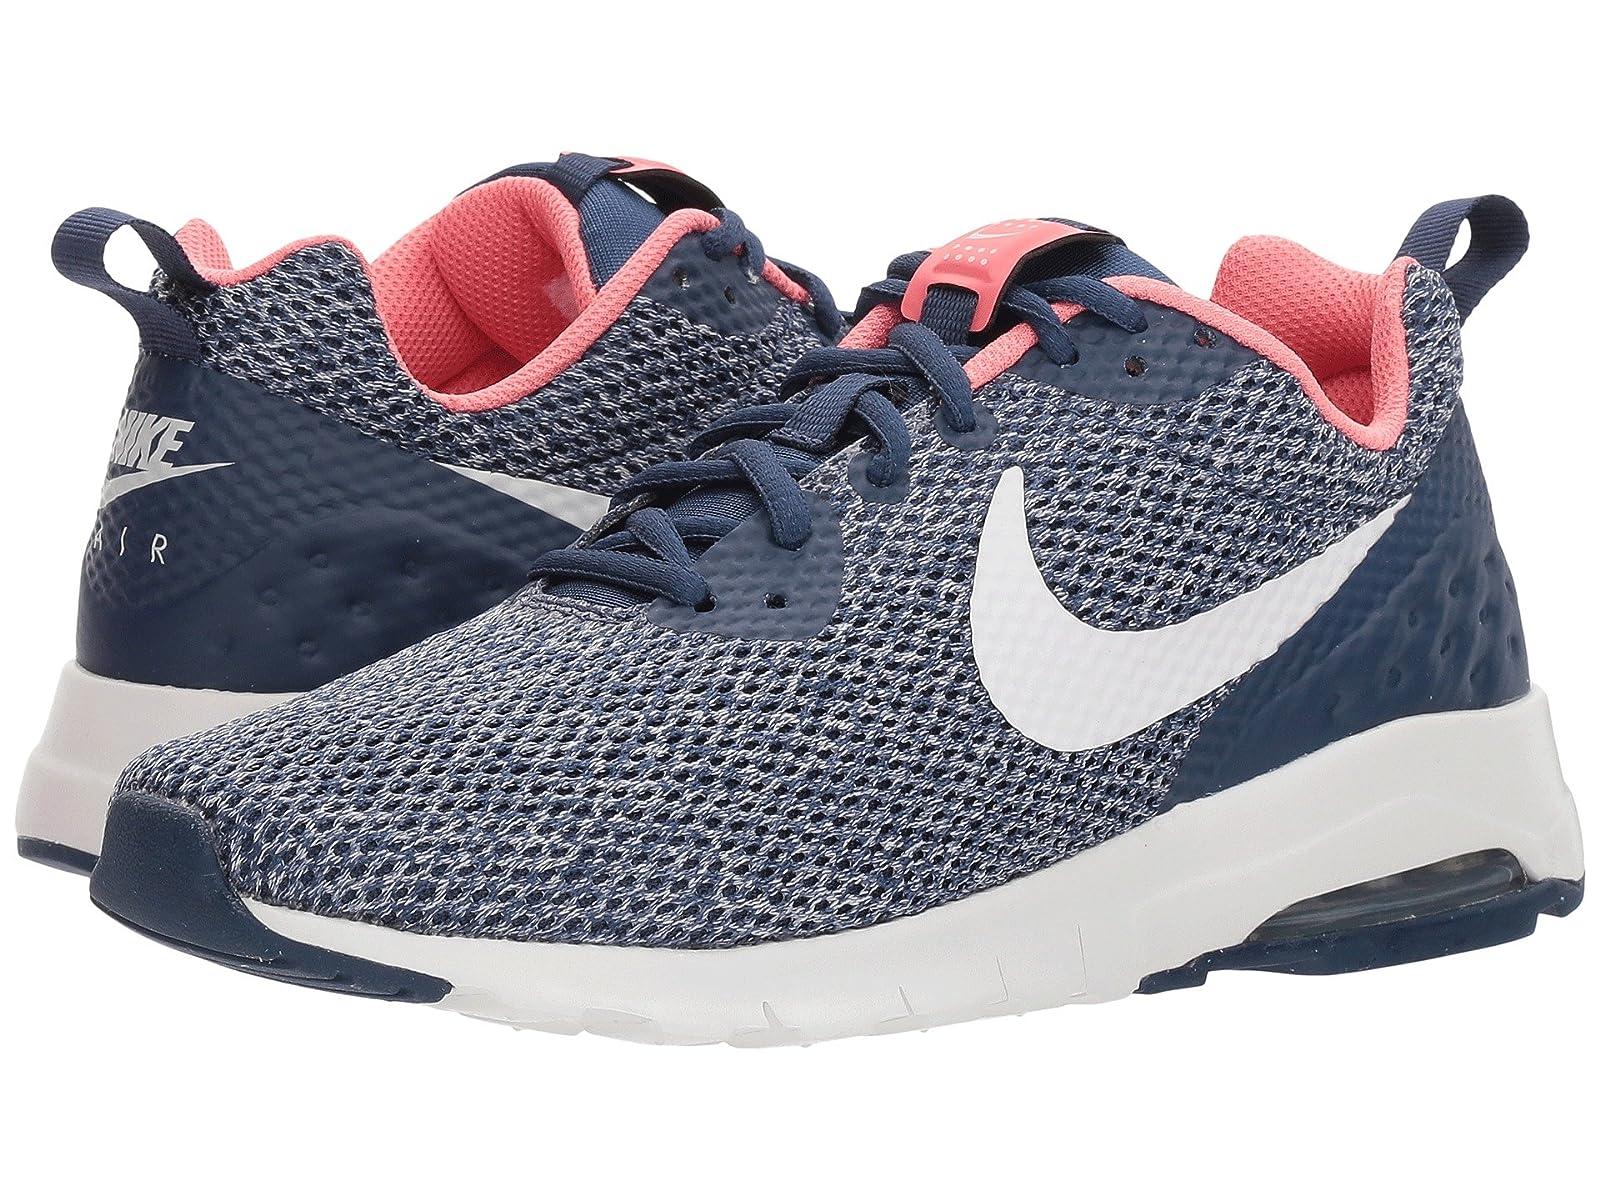 Men's/Women's: LW Nike Air Max Motion Lightweight LW Men's/Women's: : Every Week New 28de86